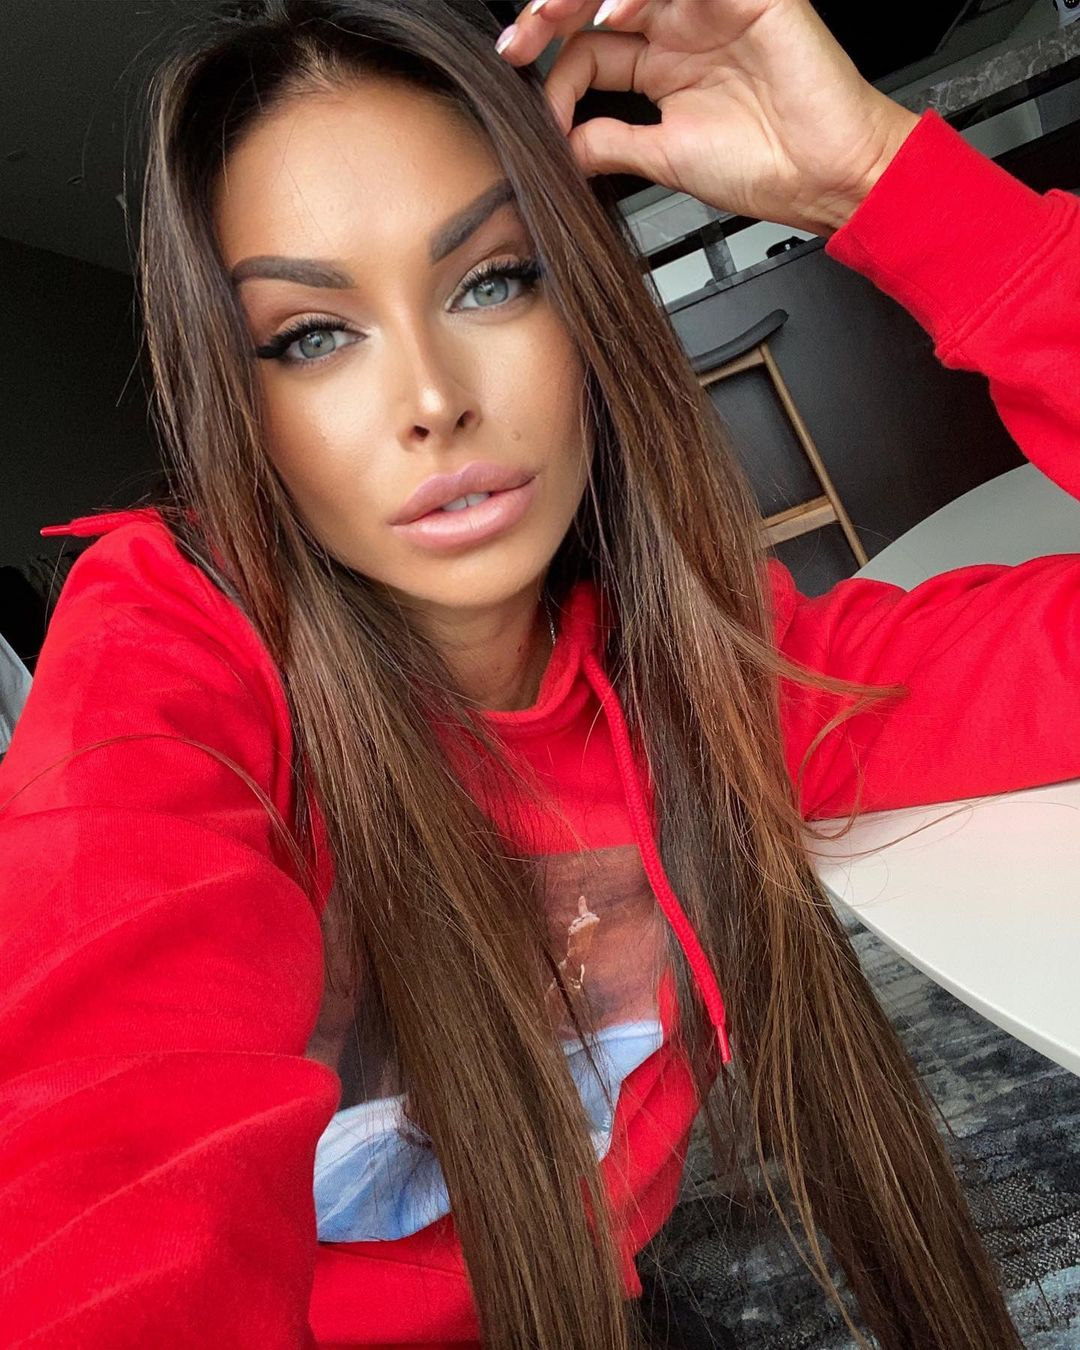 Evgenia-Alex-Wallpapers-Insta-Fit-BIo-13